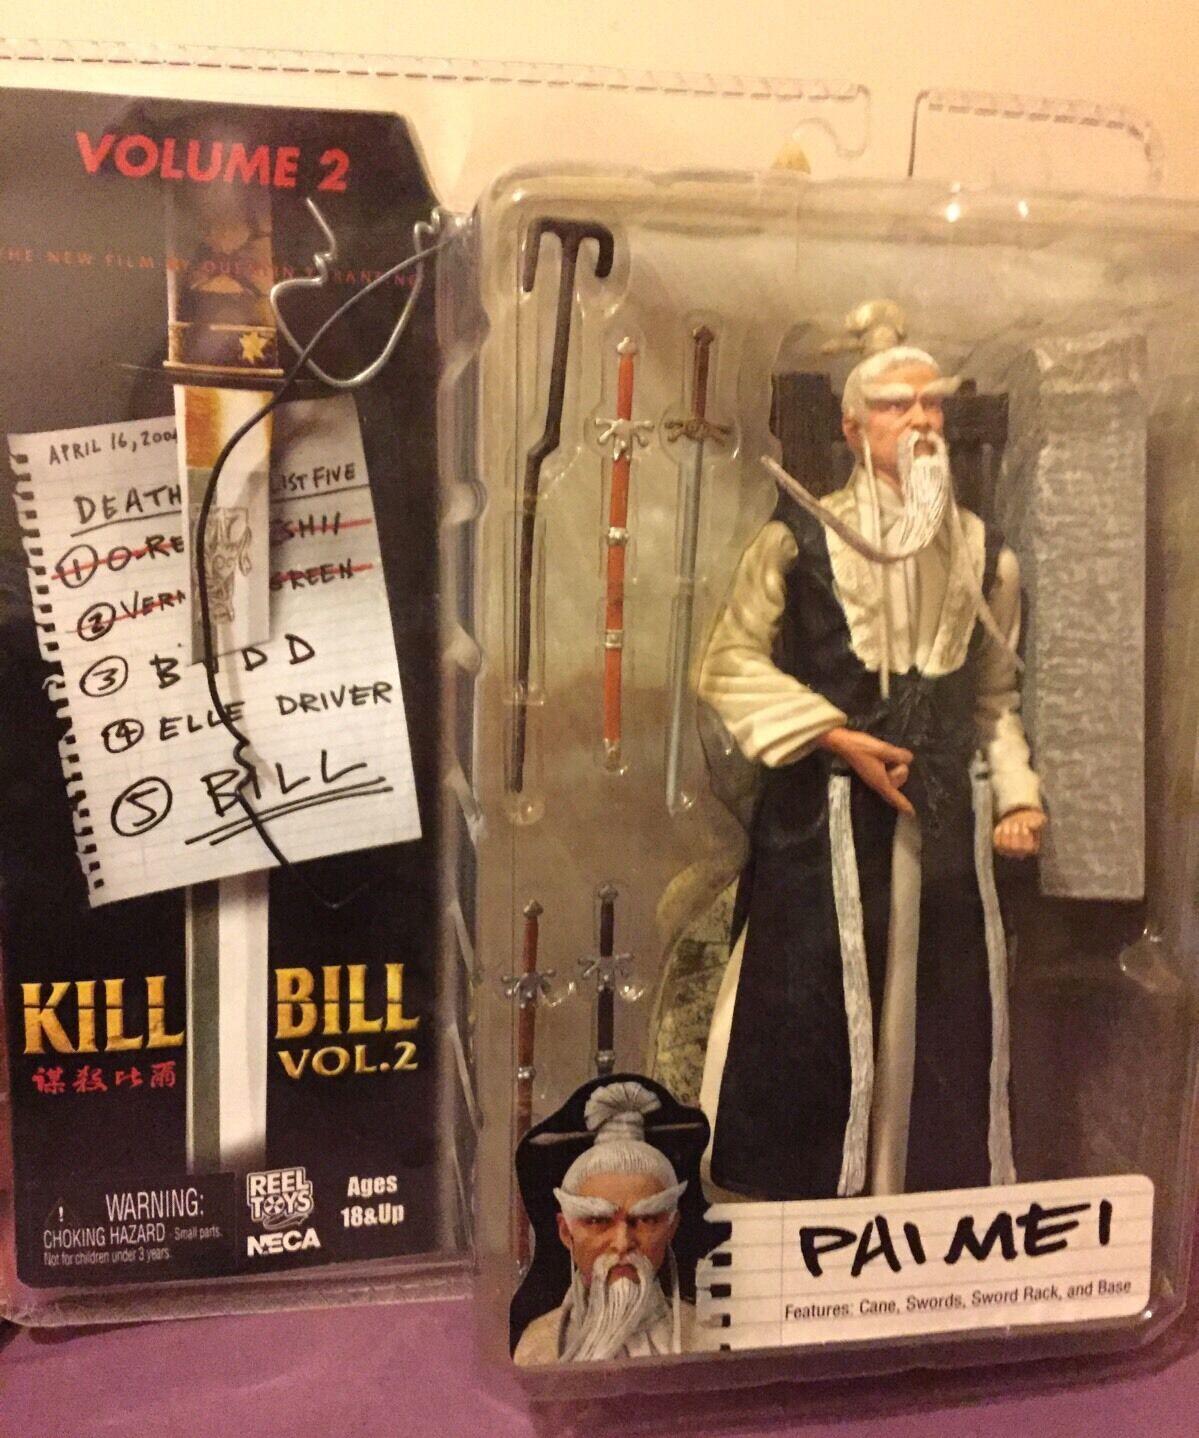 PAI MEI azione cifra-KILL BILL BILL BILL VOLUME 2-Neca Reel giocattoli 2005-RARA 5ac5ae